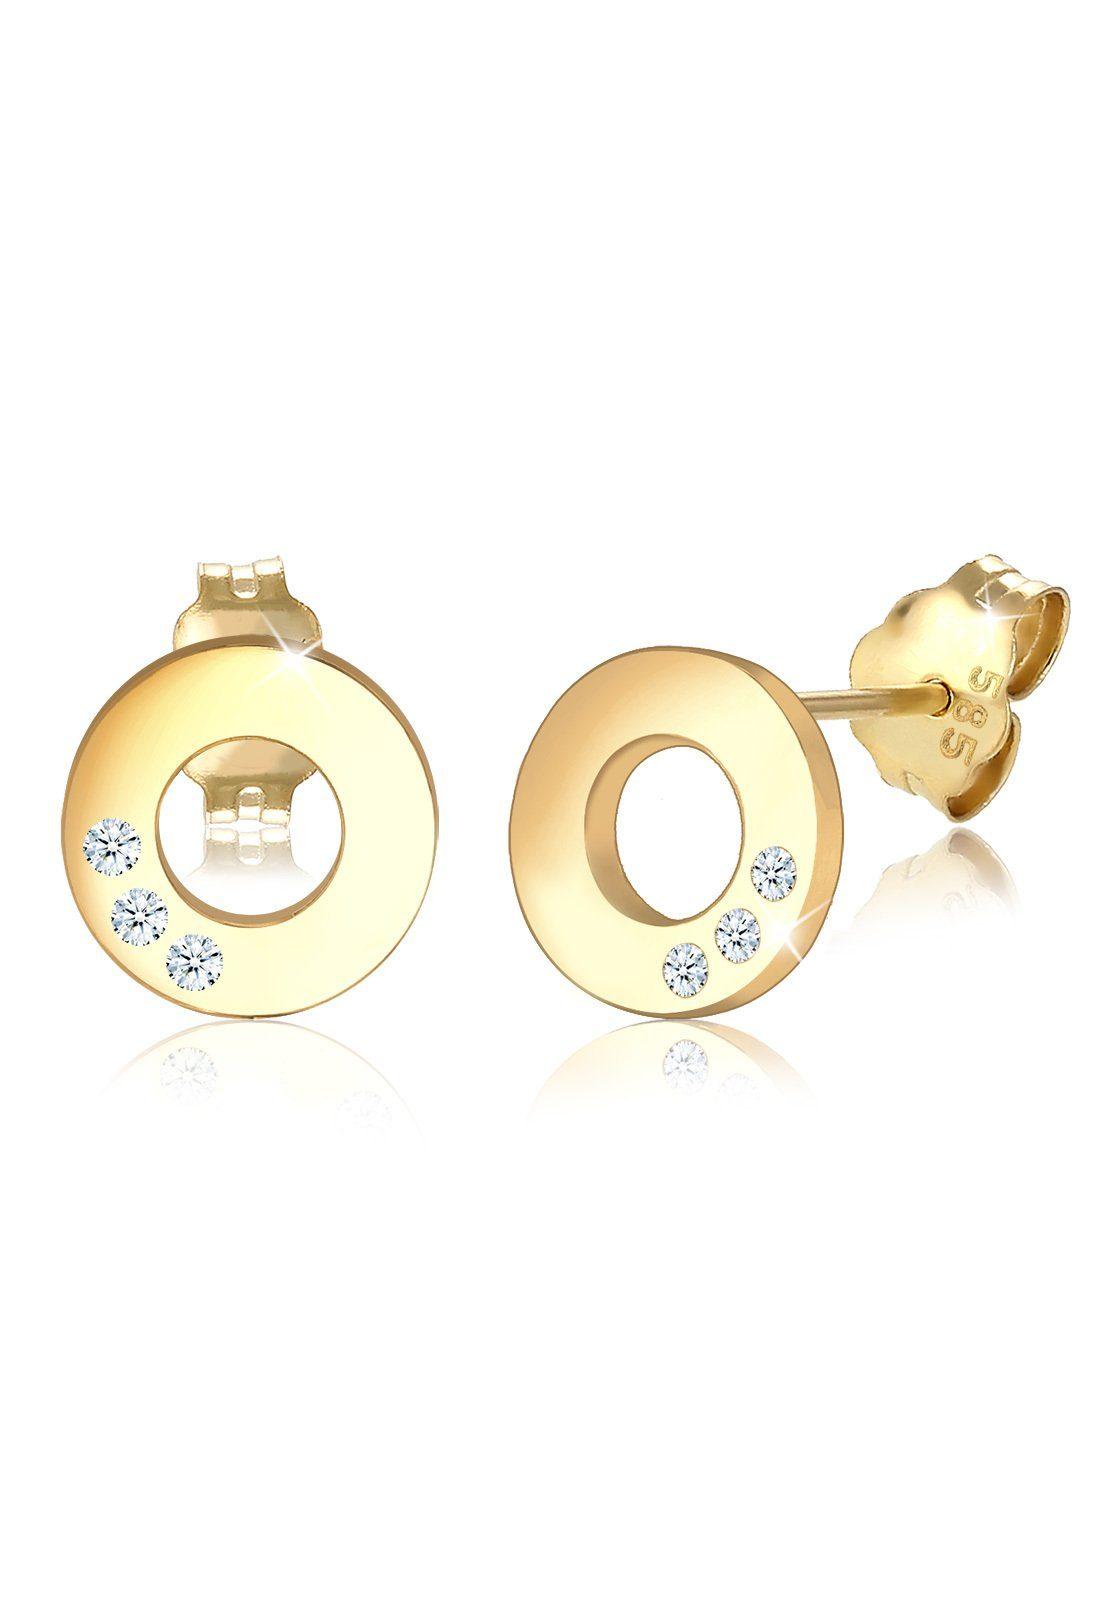 diamore-paar-ohrstecker-kreis-geo-elegant-diamant-006-ct-585-gelbgold.jpg  original  d56a6b6350f0